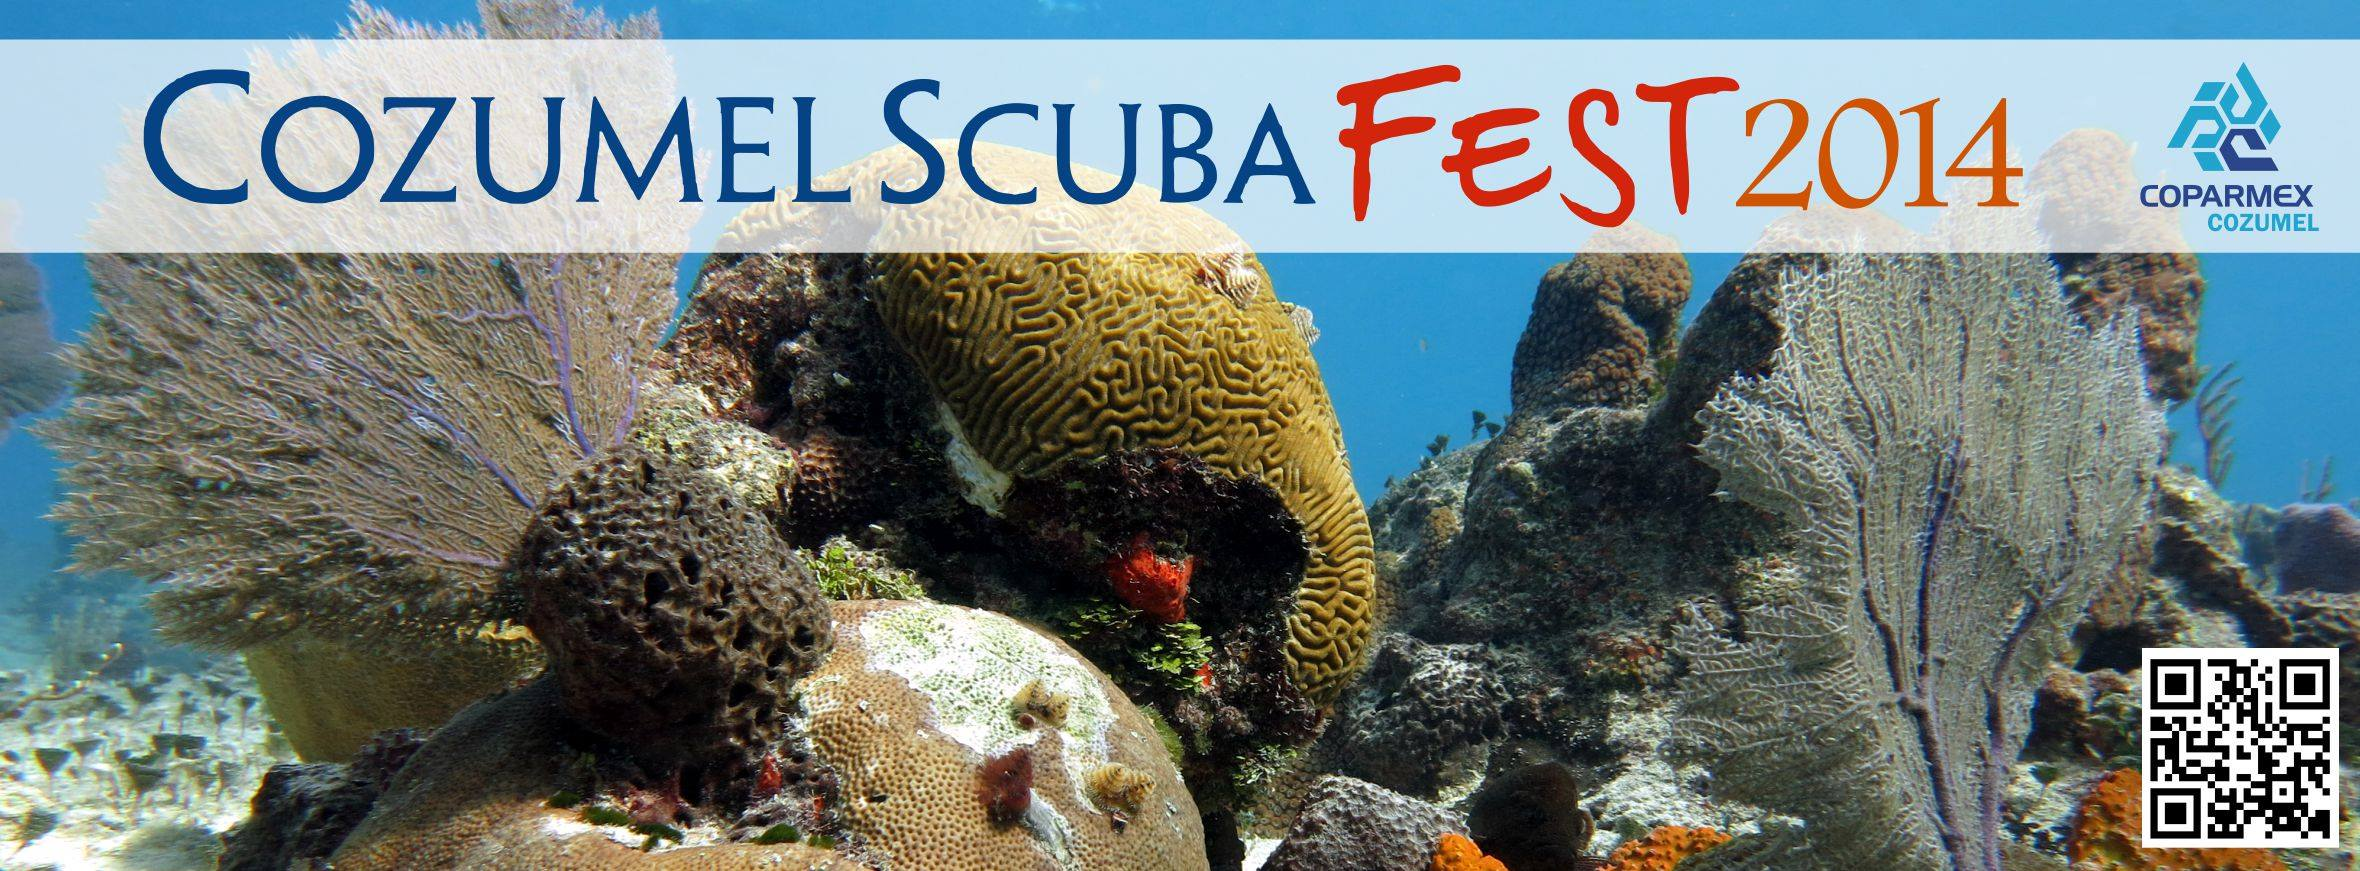 Cozumel Scuba Fest 2014